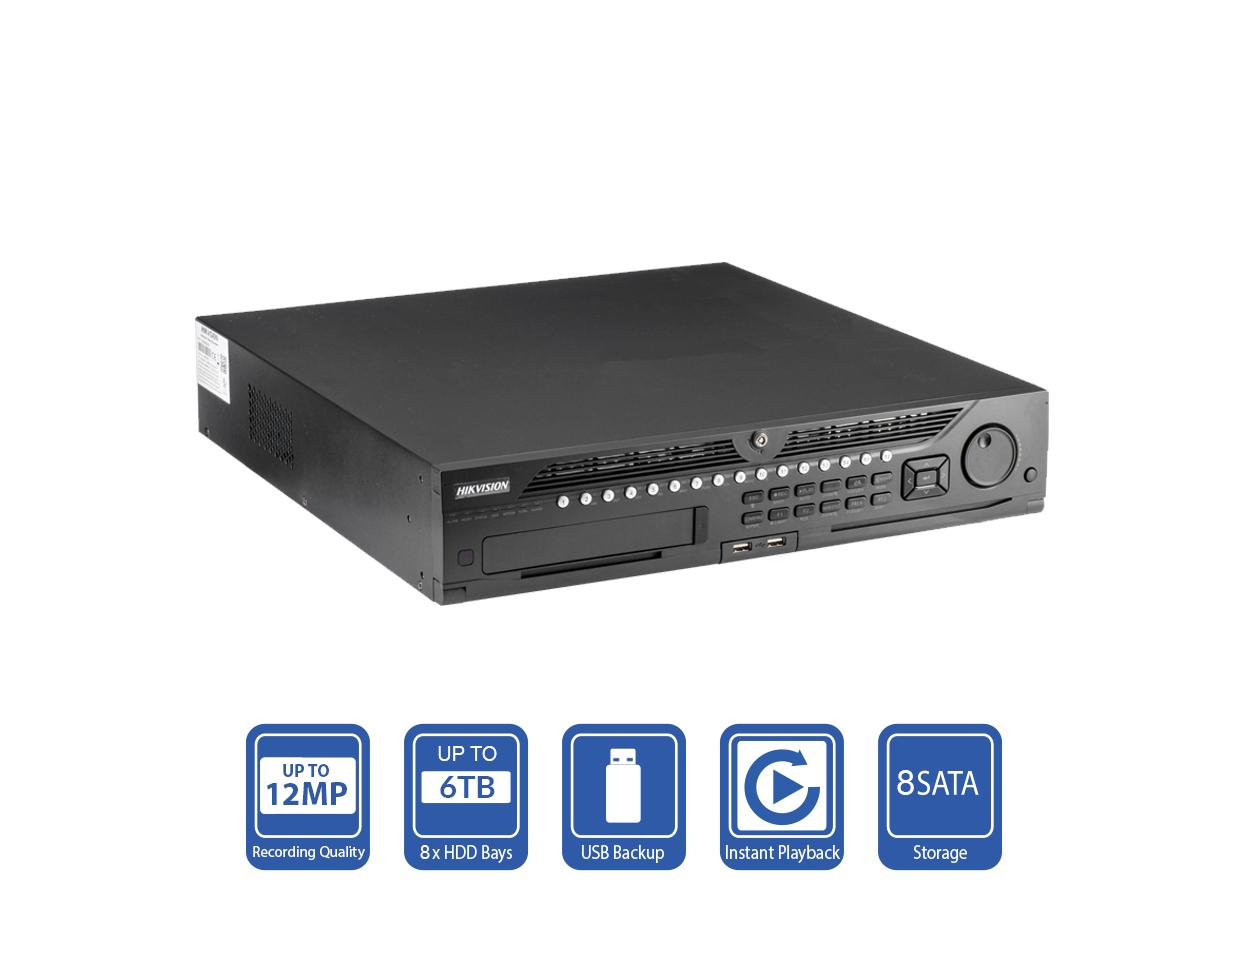 DS-9632NI-I8 - Hikvision 32 Channel NVR